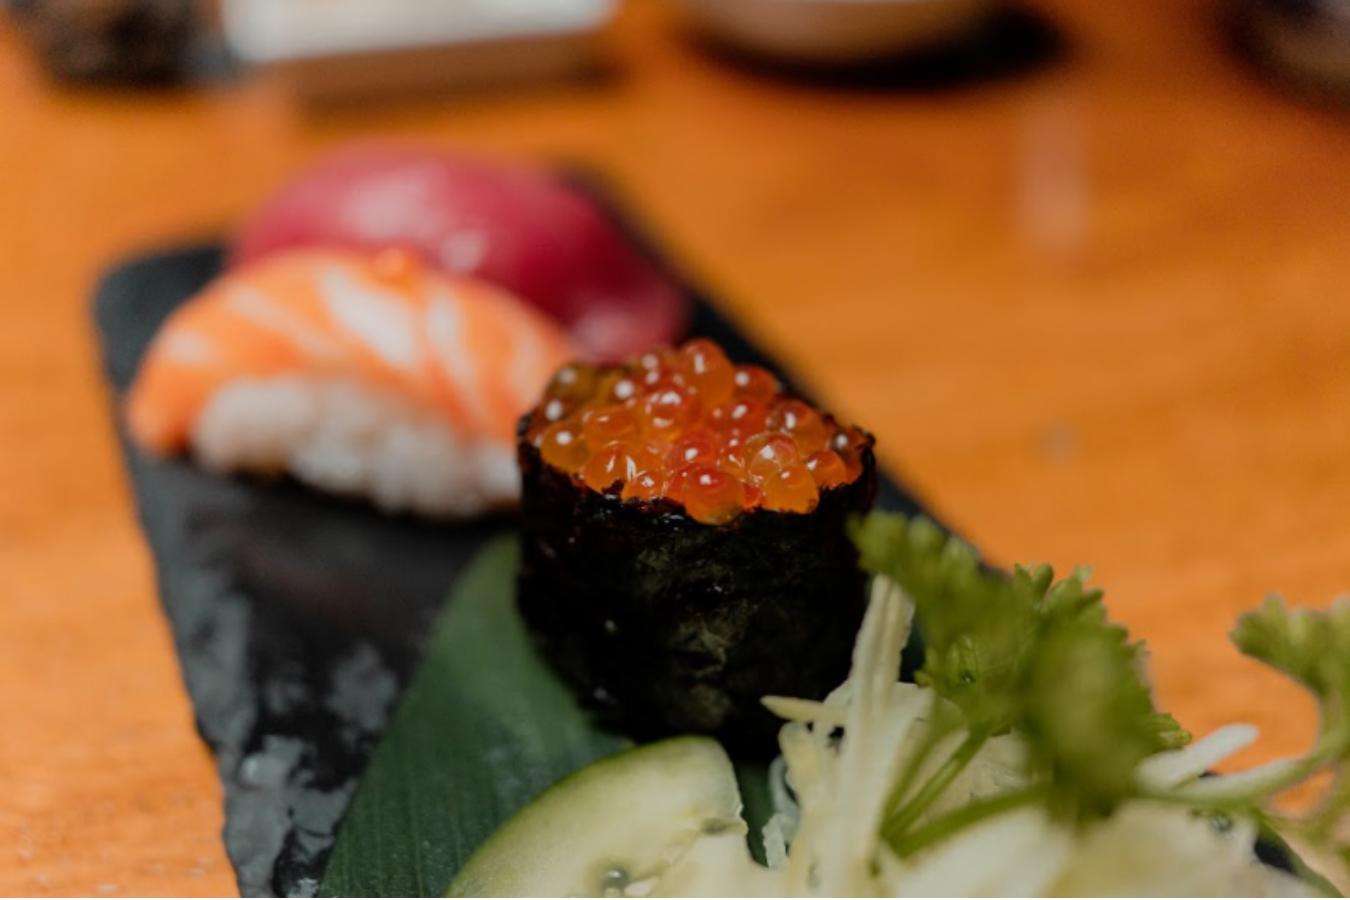 restaurante comida japonesa, nigiris